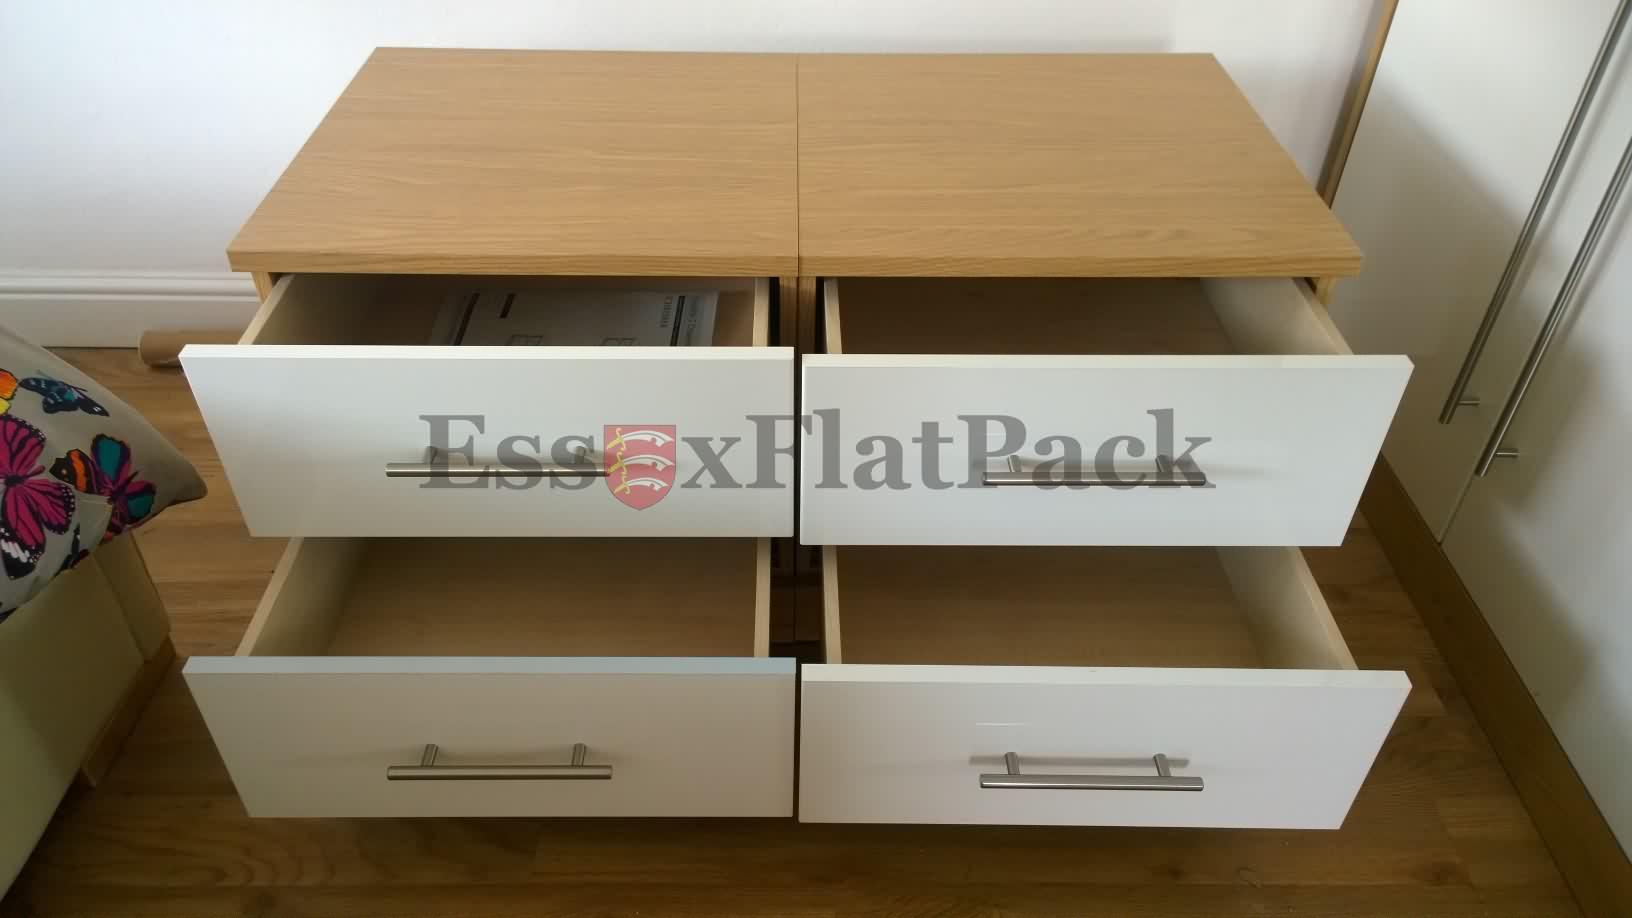 essexflatpack-furniture-20140830175219.jpg